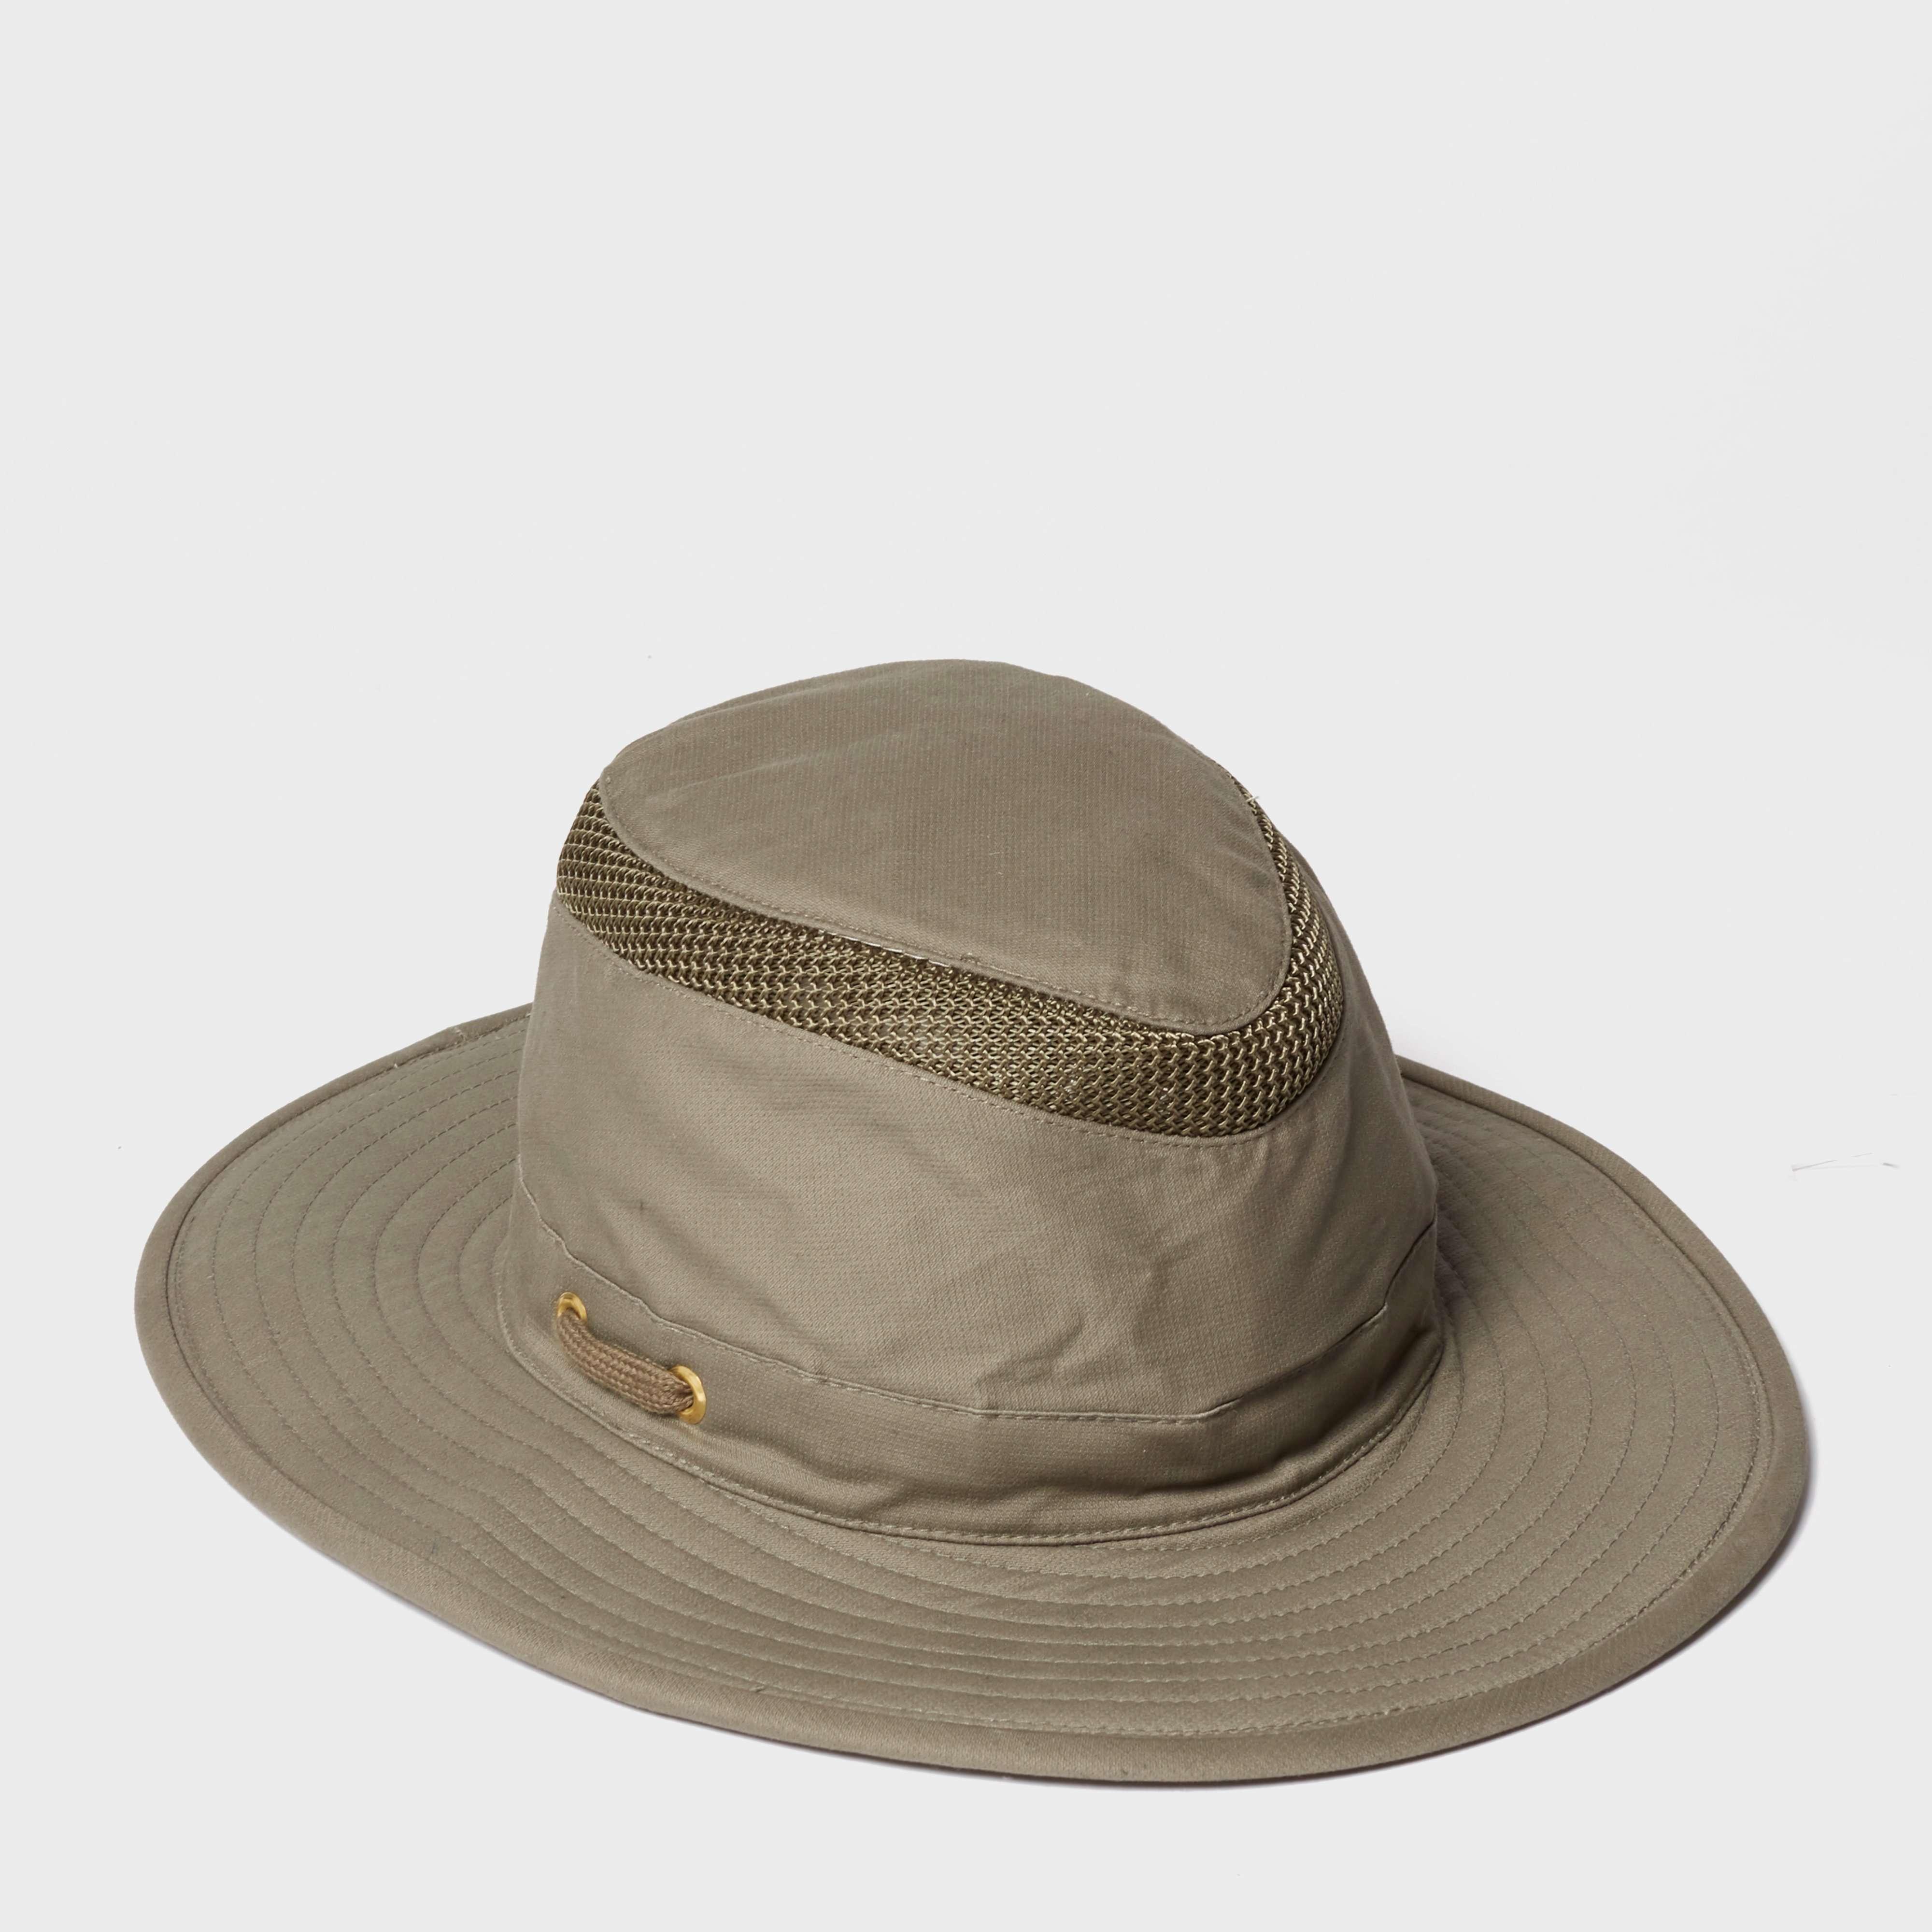 TILLEY Unisex T4MO-1 Hiker's Hat